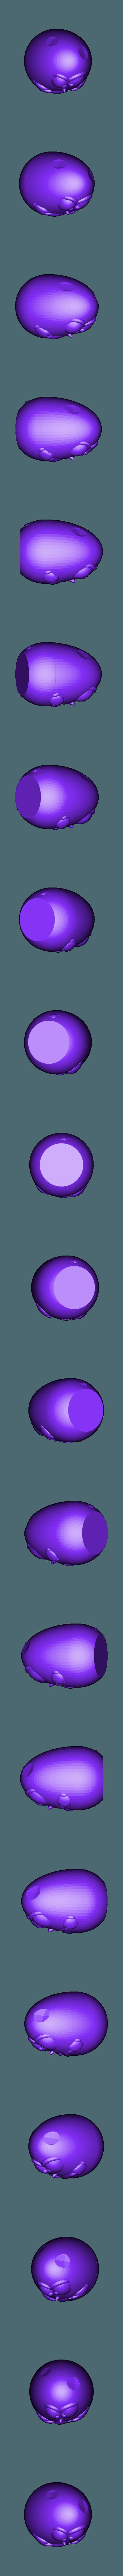 Rotton_Guy_2.stl Download free STL file Rotton Eggs! • 3D printer model, 8ran